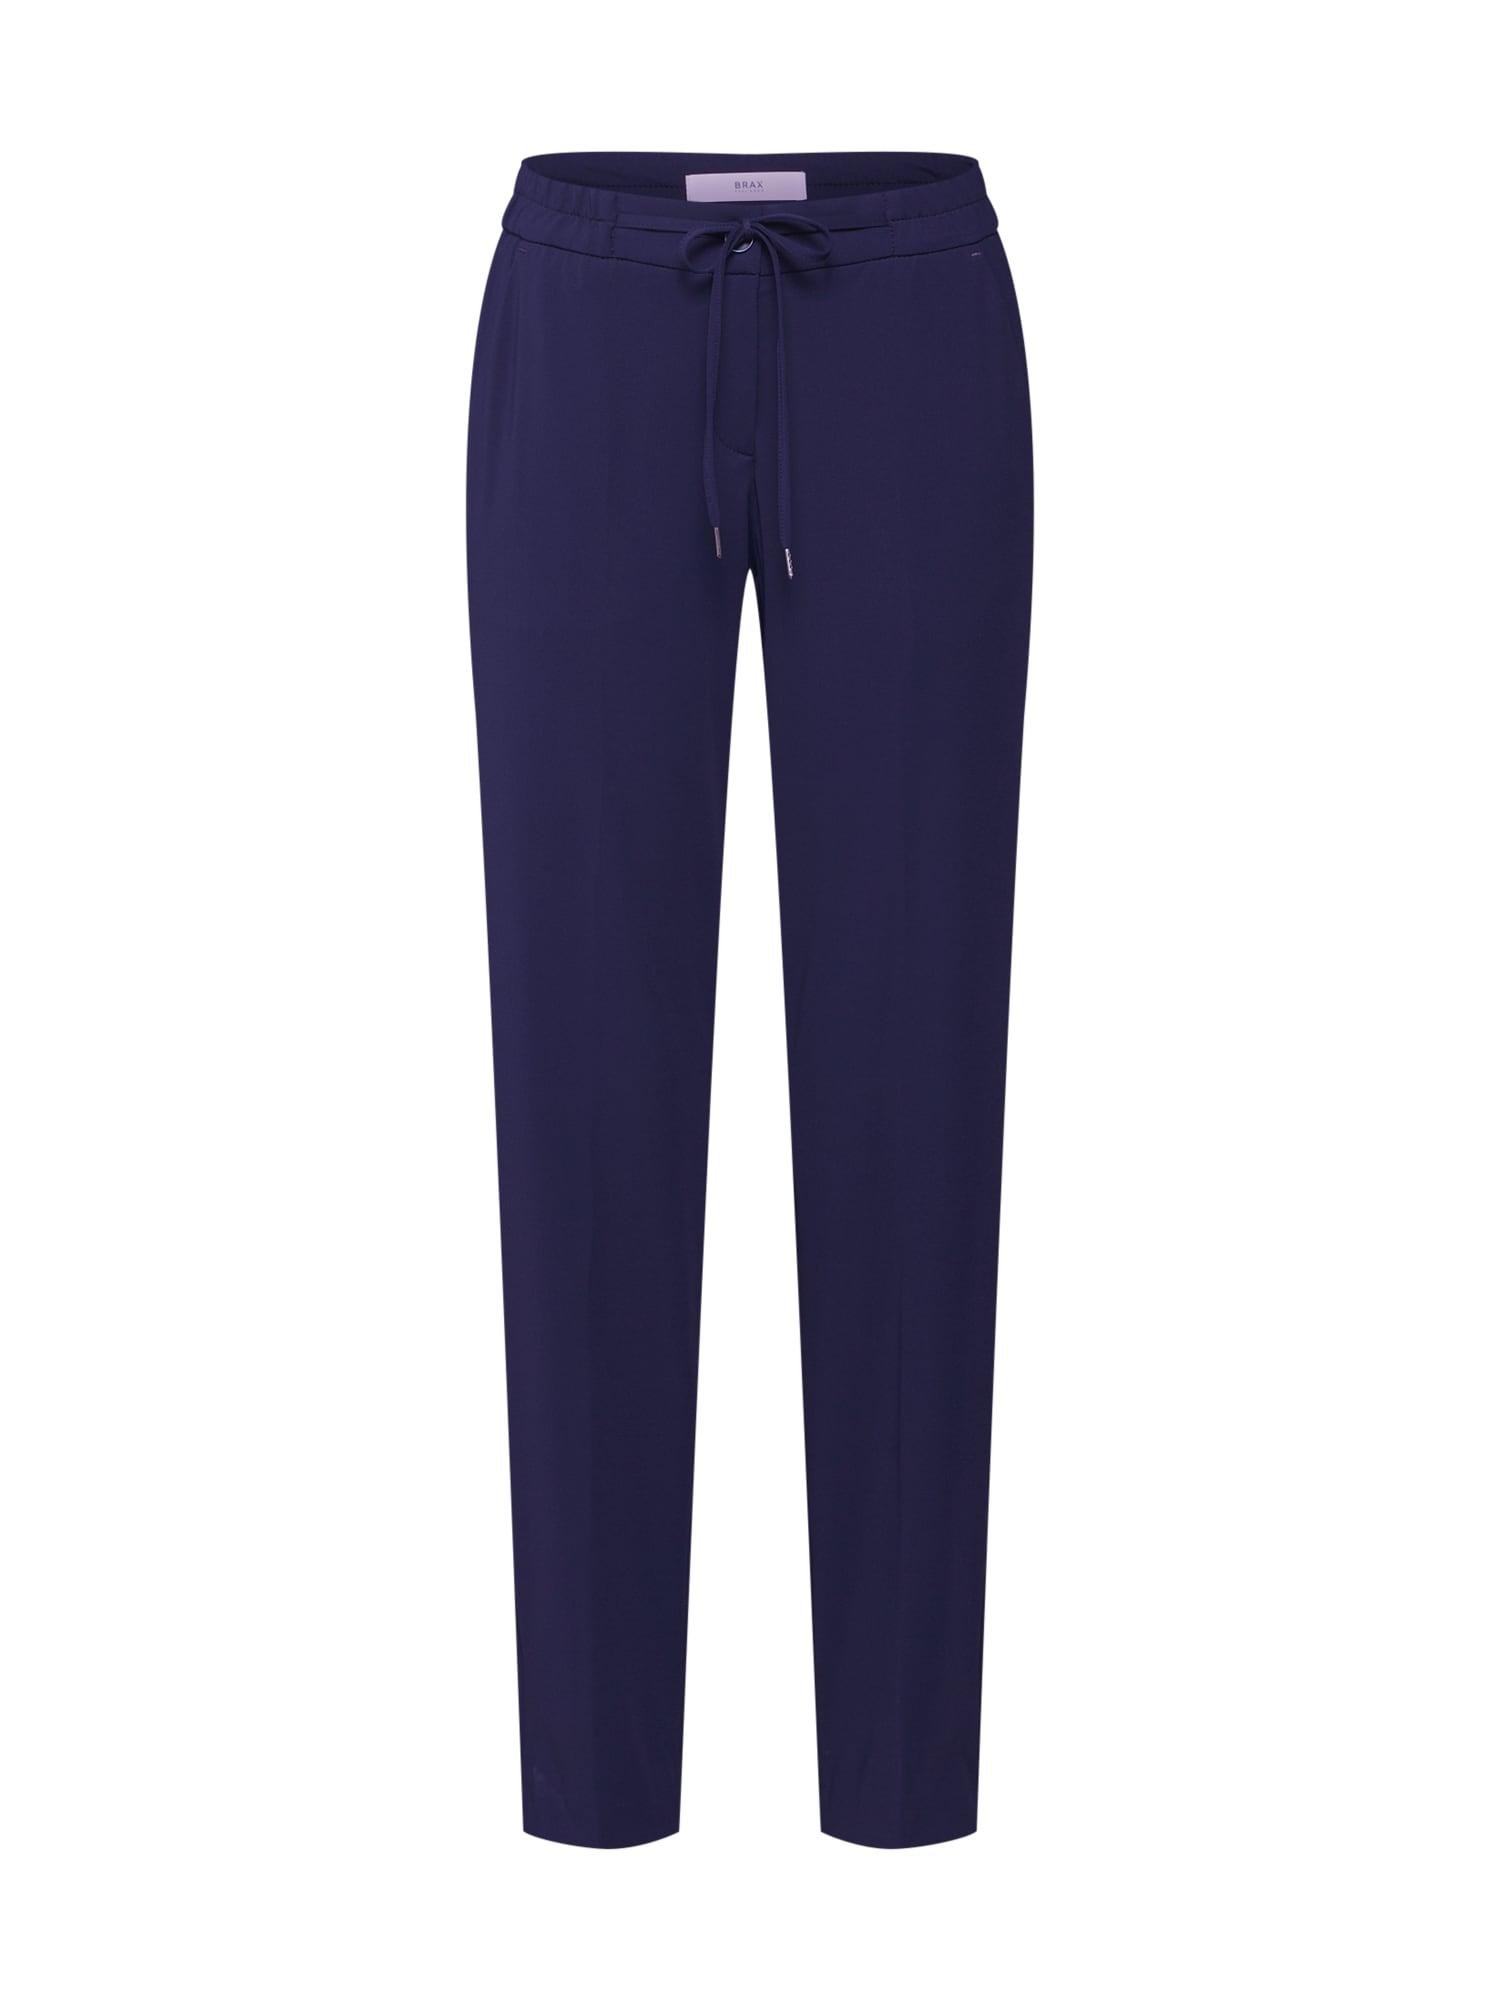 Chino kalhoty Mareen tmavě modrá BRAX